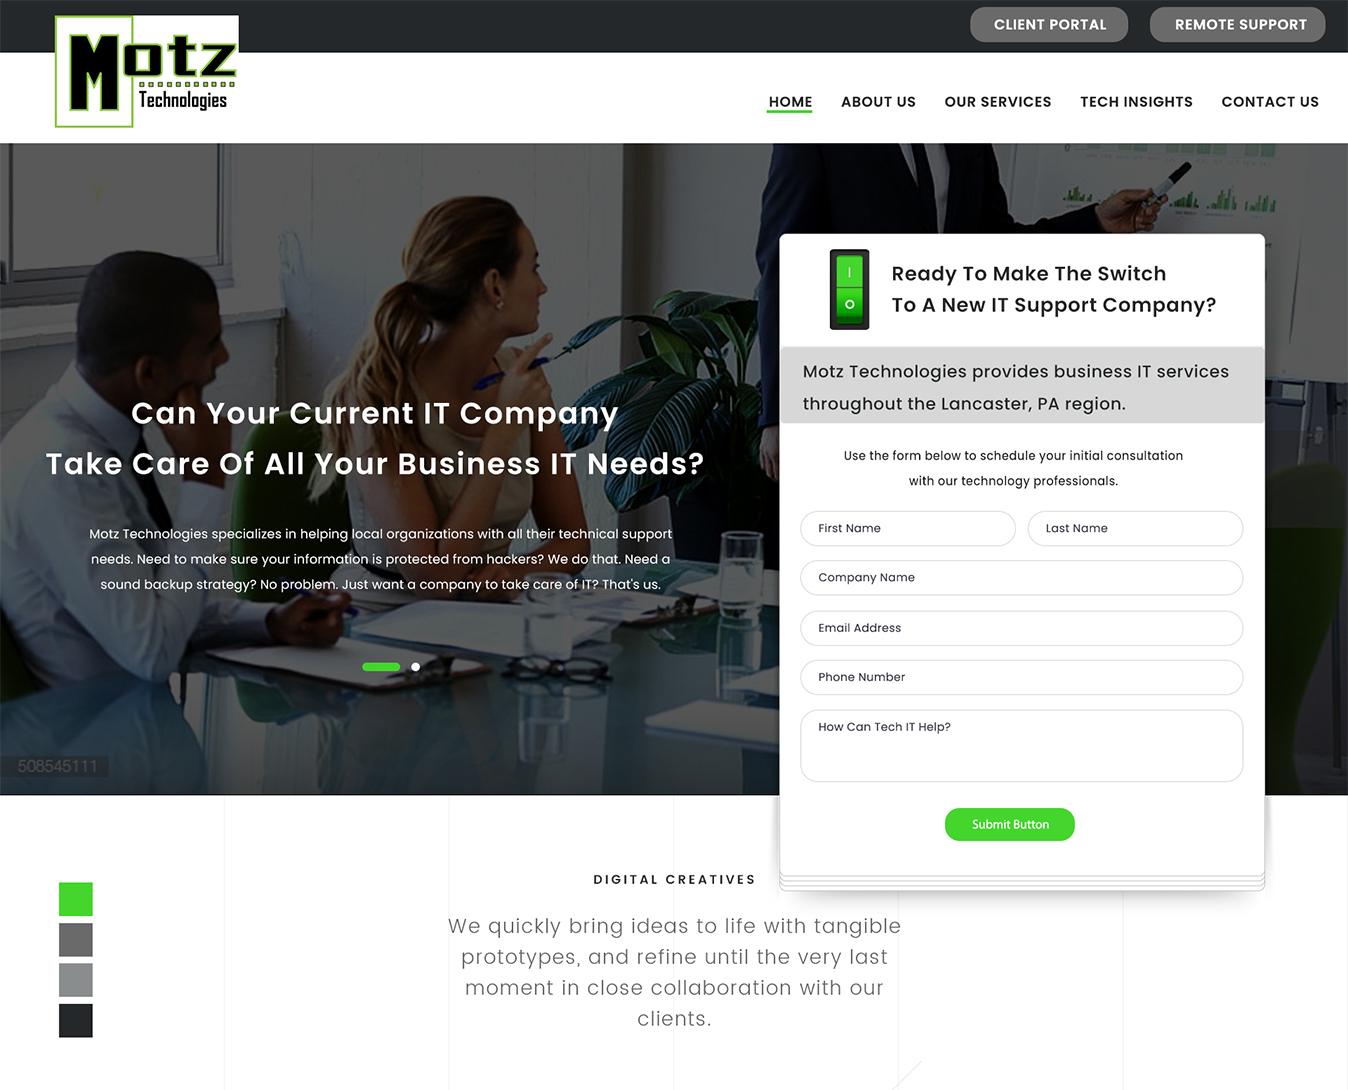 motz-web-design